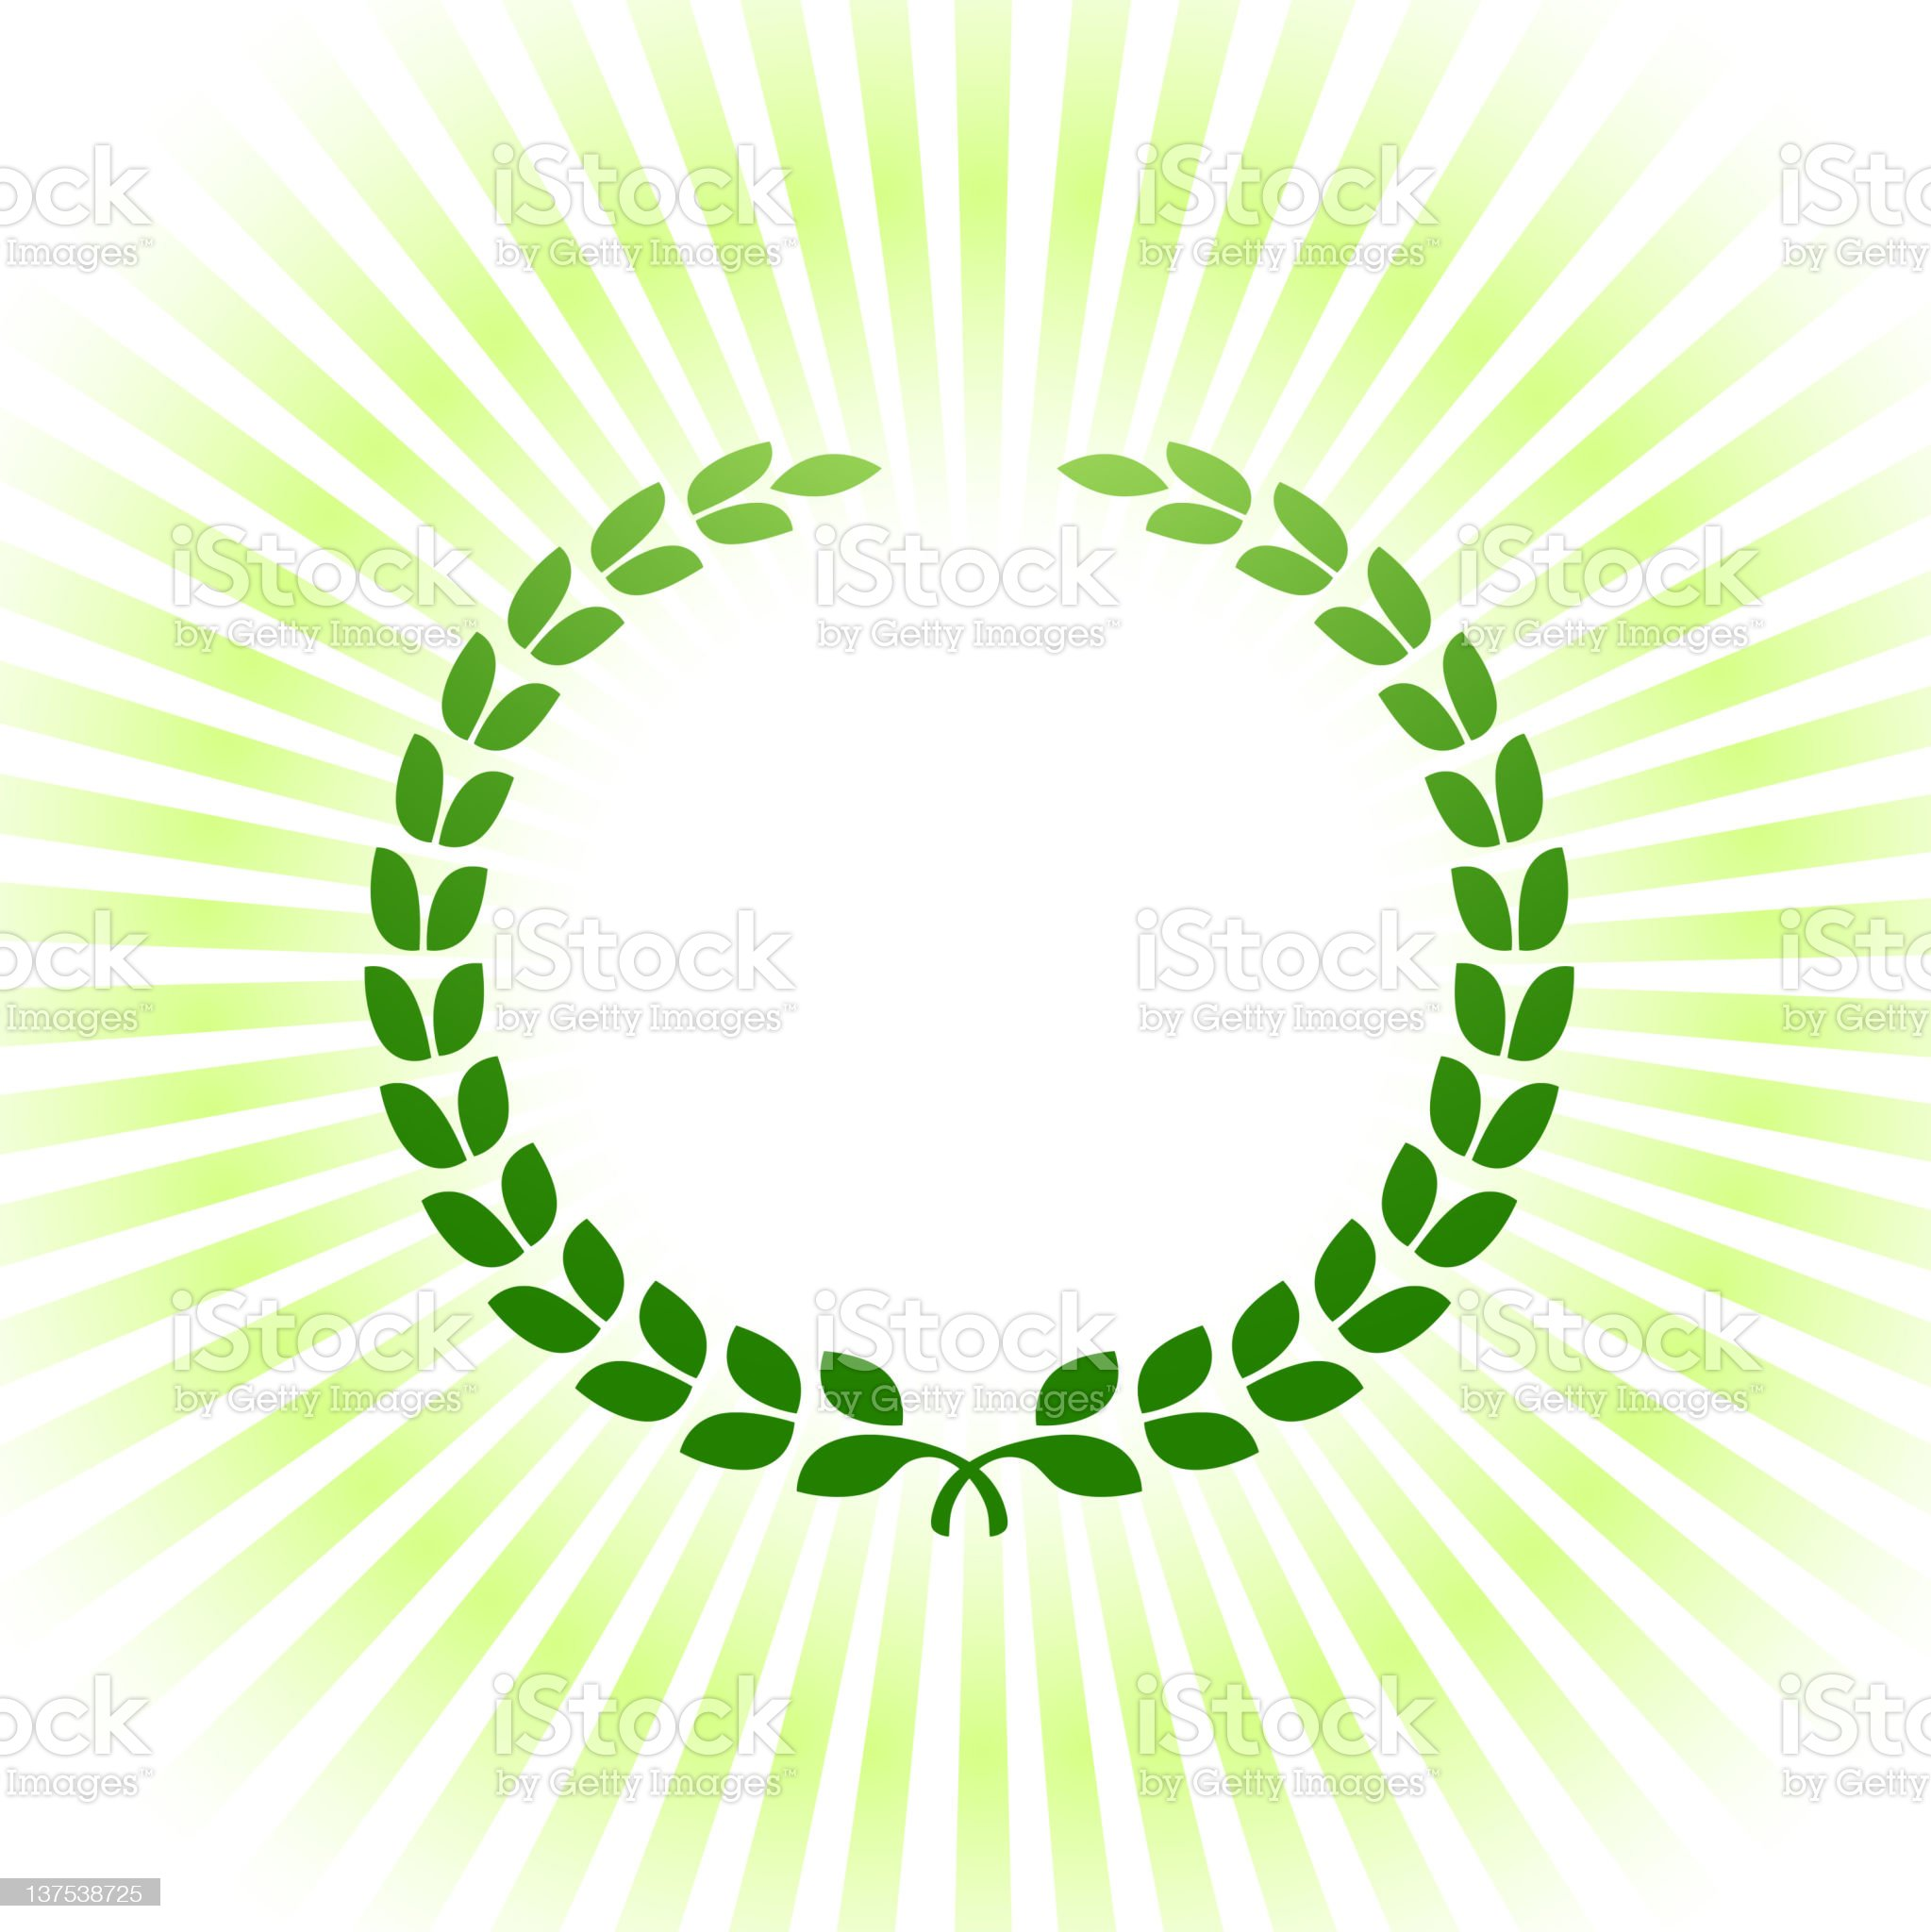 Green laurel royalty-free vector Background royalty free vector royalty-free stock vector art